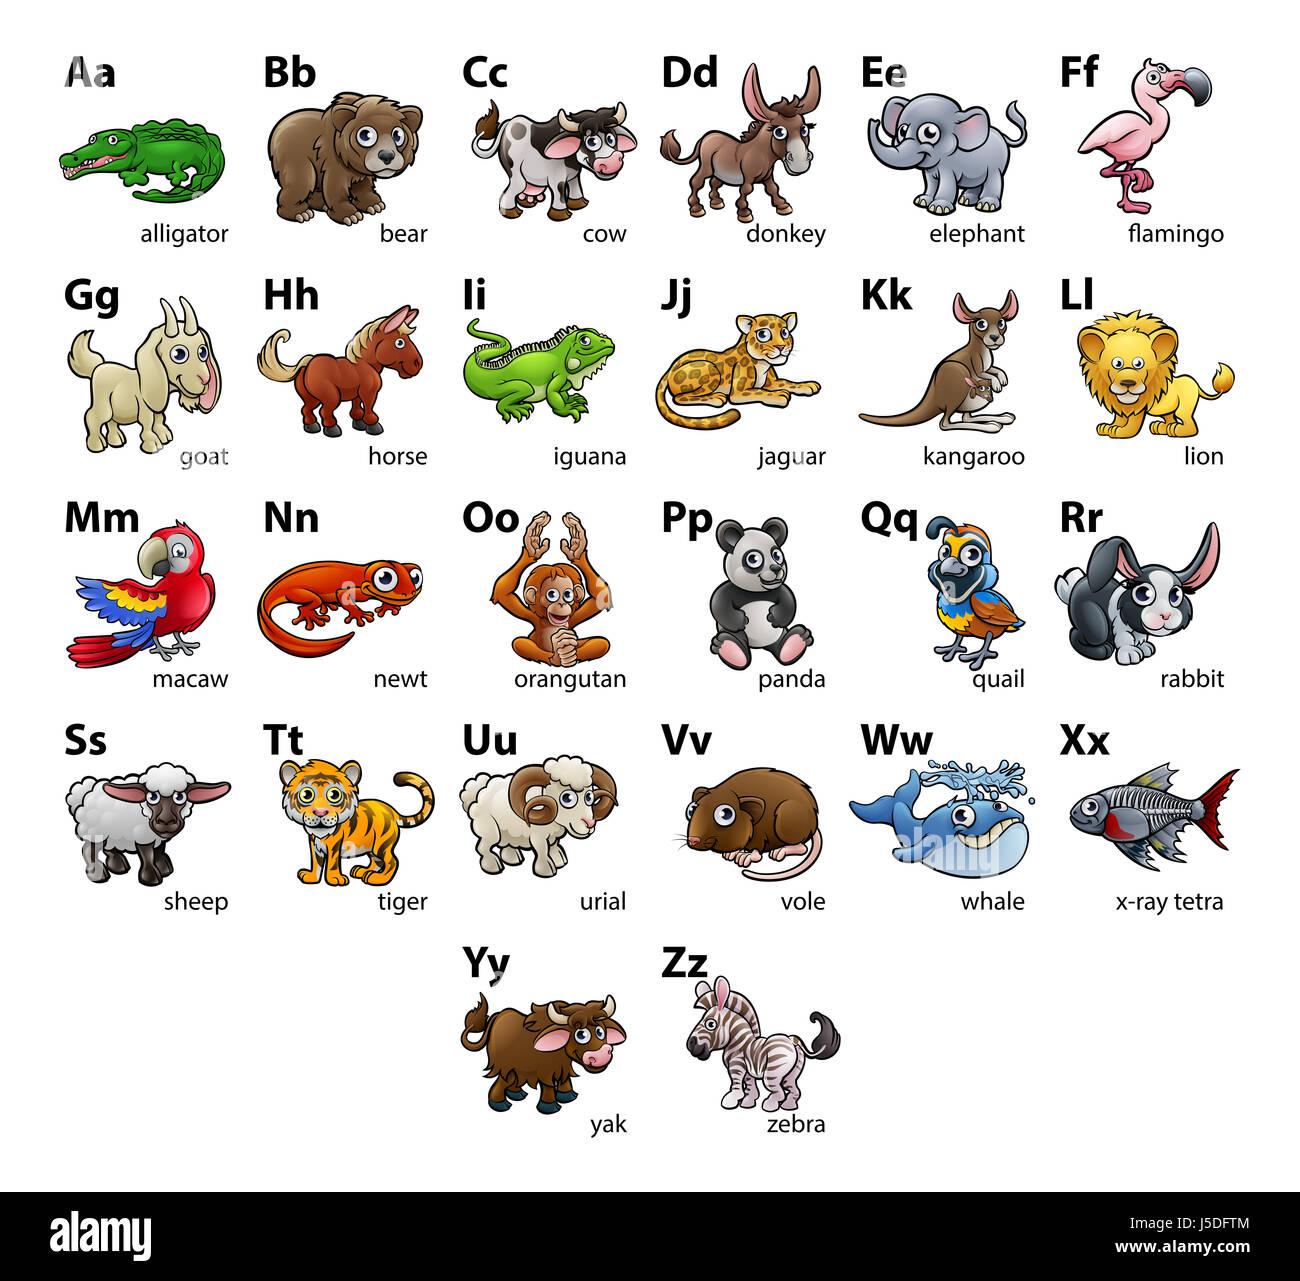 A Cartoon Animal Alphabet Set Abc Educational Wall Chart